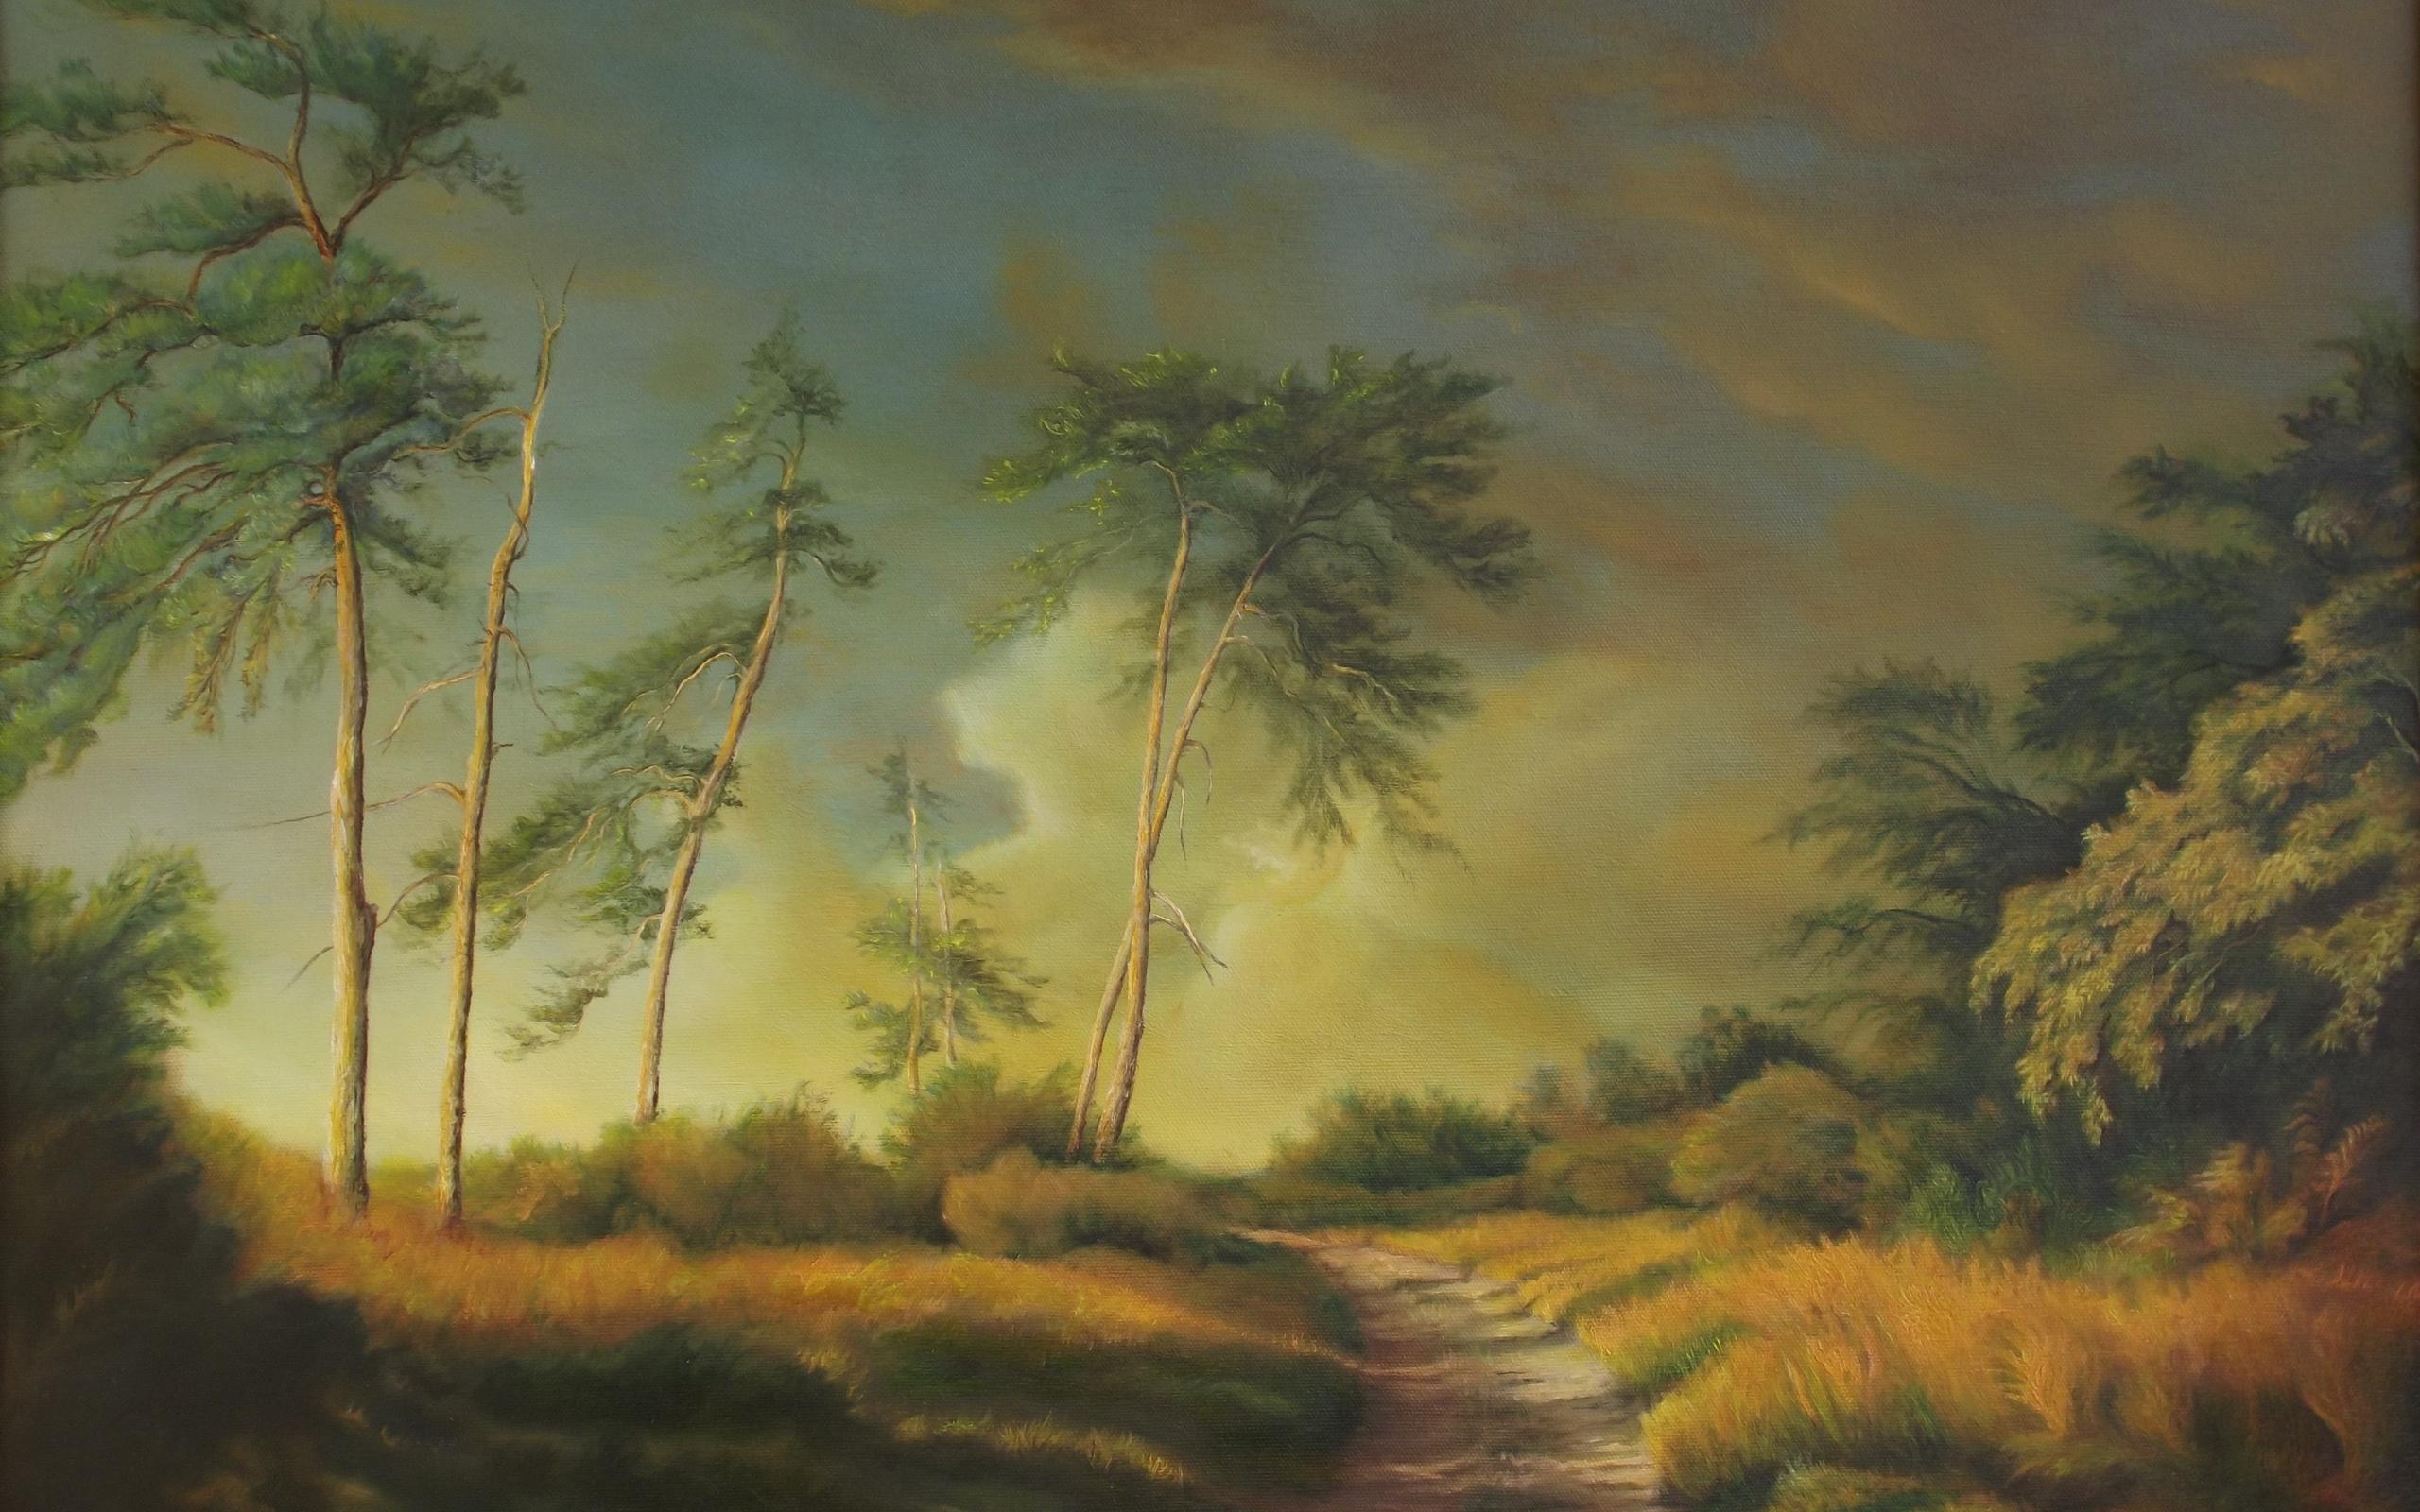 2560x1600 landscape drawing wallpaper - photo #28